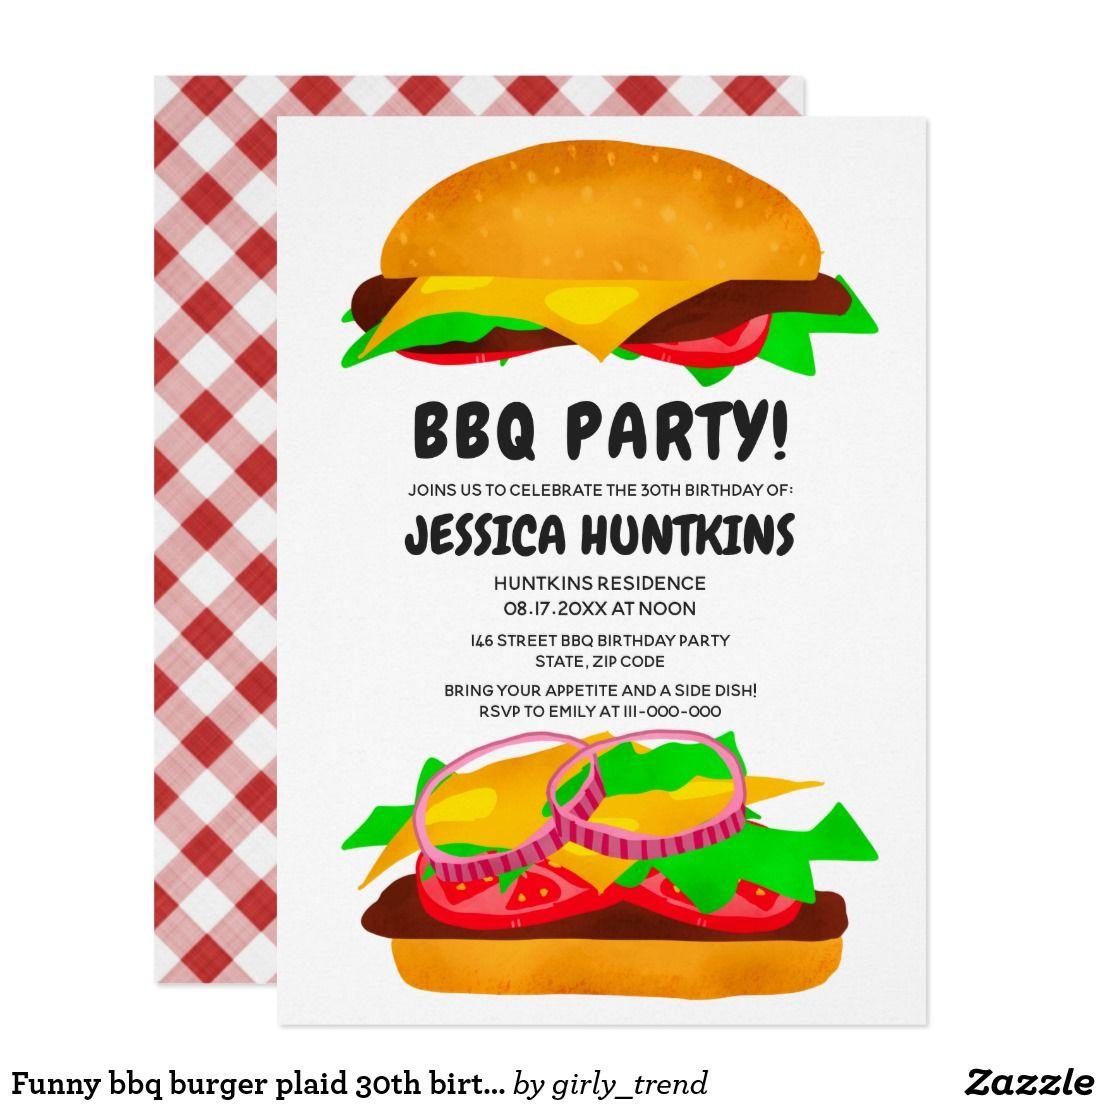 Funny bbq burger plaid 30th birthday party invitat